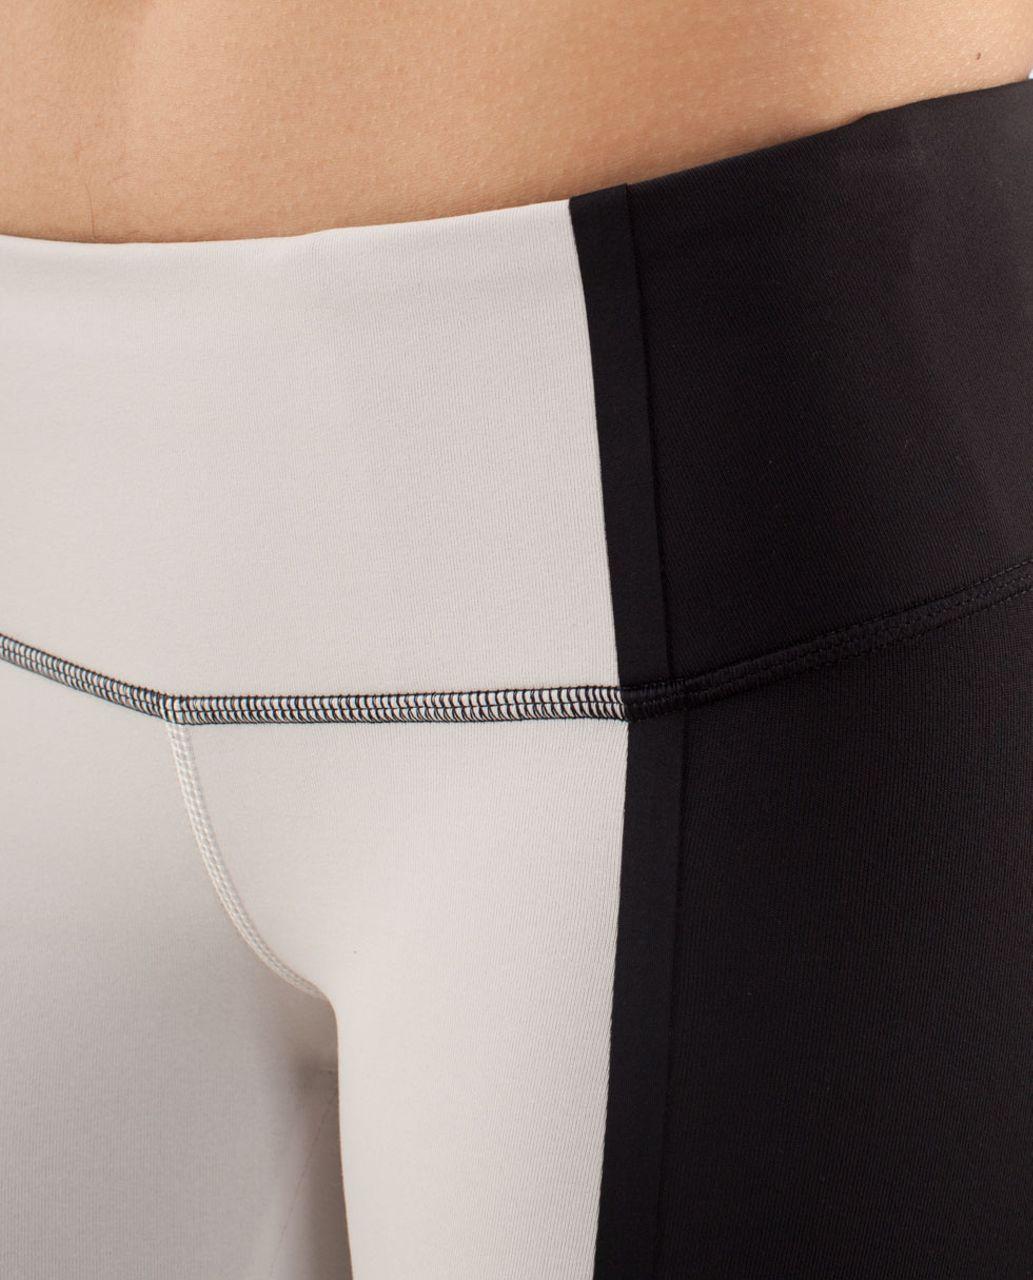 Lululemon Wunder Under Pant *Bonded Stripe - Dune / Black / Black